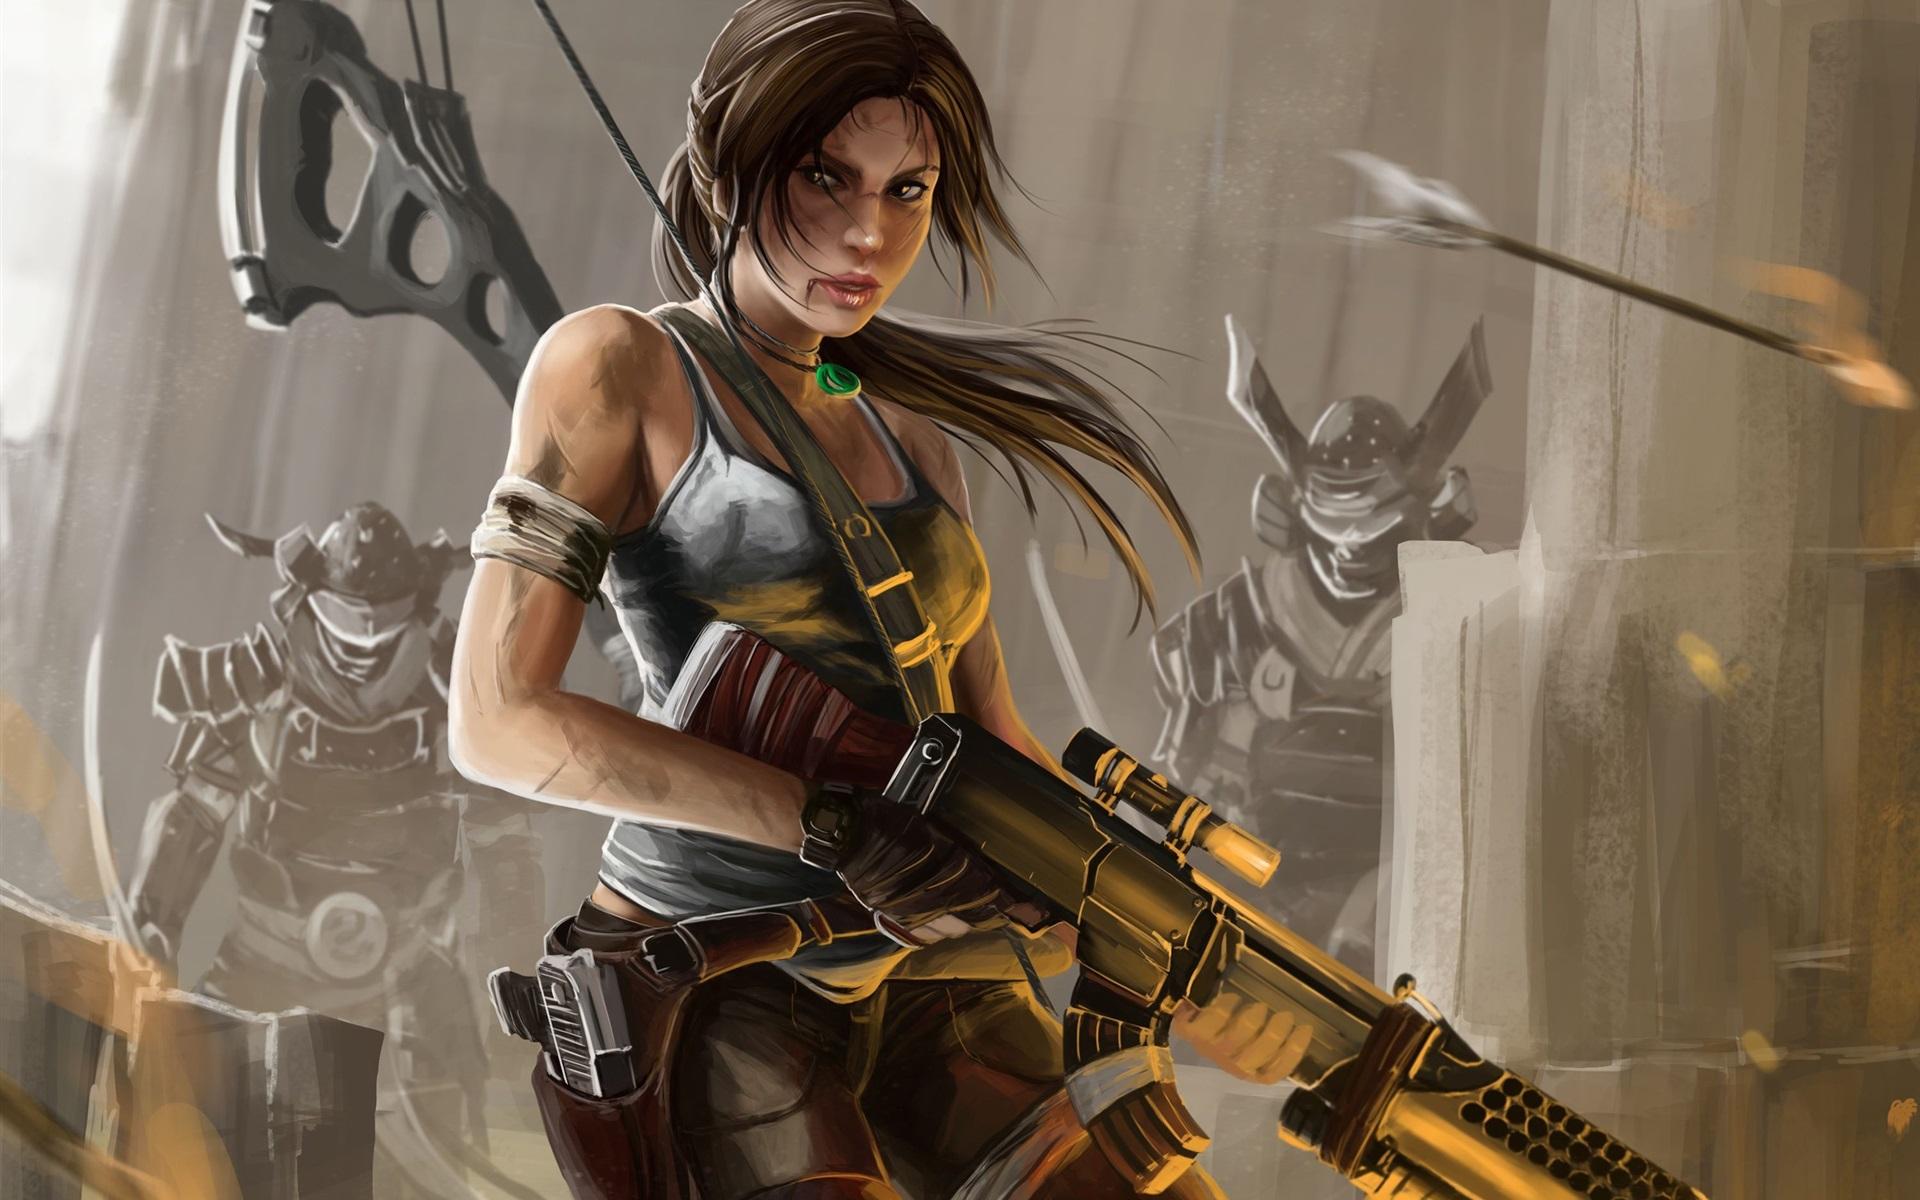 7680x4320 Lara Croft 8k Artwork 8k Hd 4k Wallpapers: Wallpaper Lara Croft, Tomb Raider, Art Painting 2560x1920